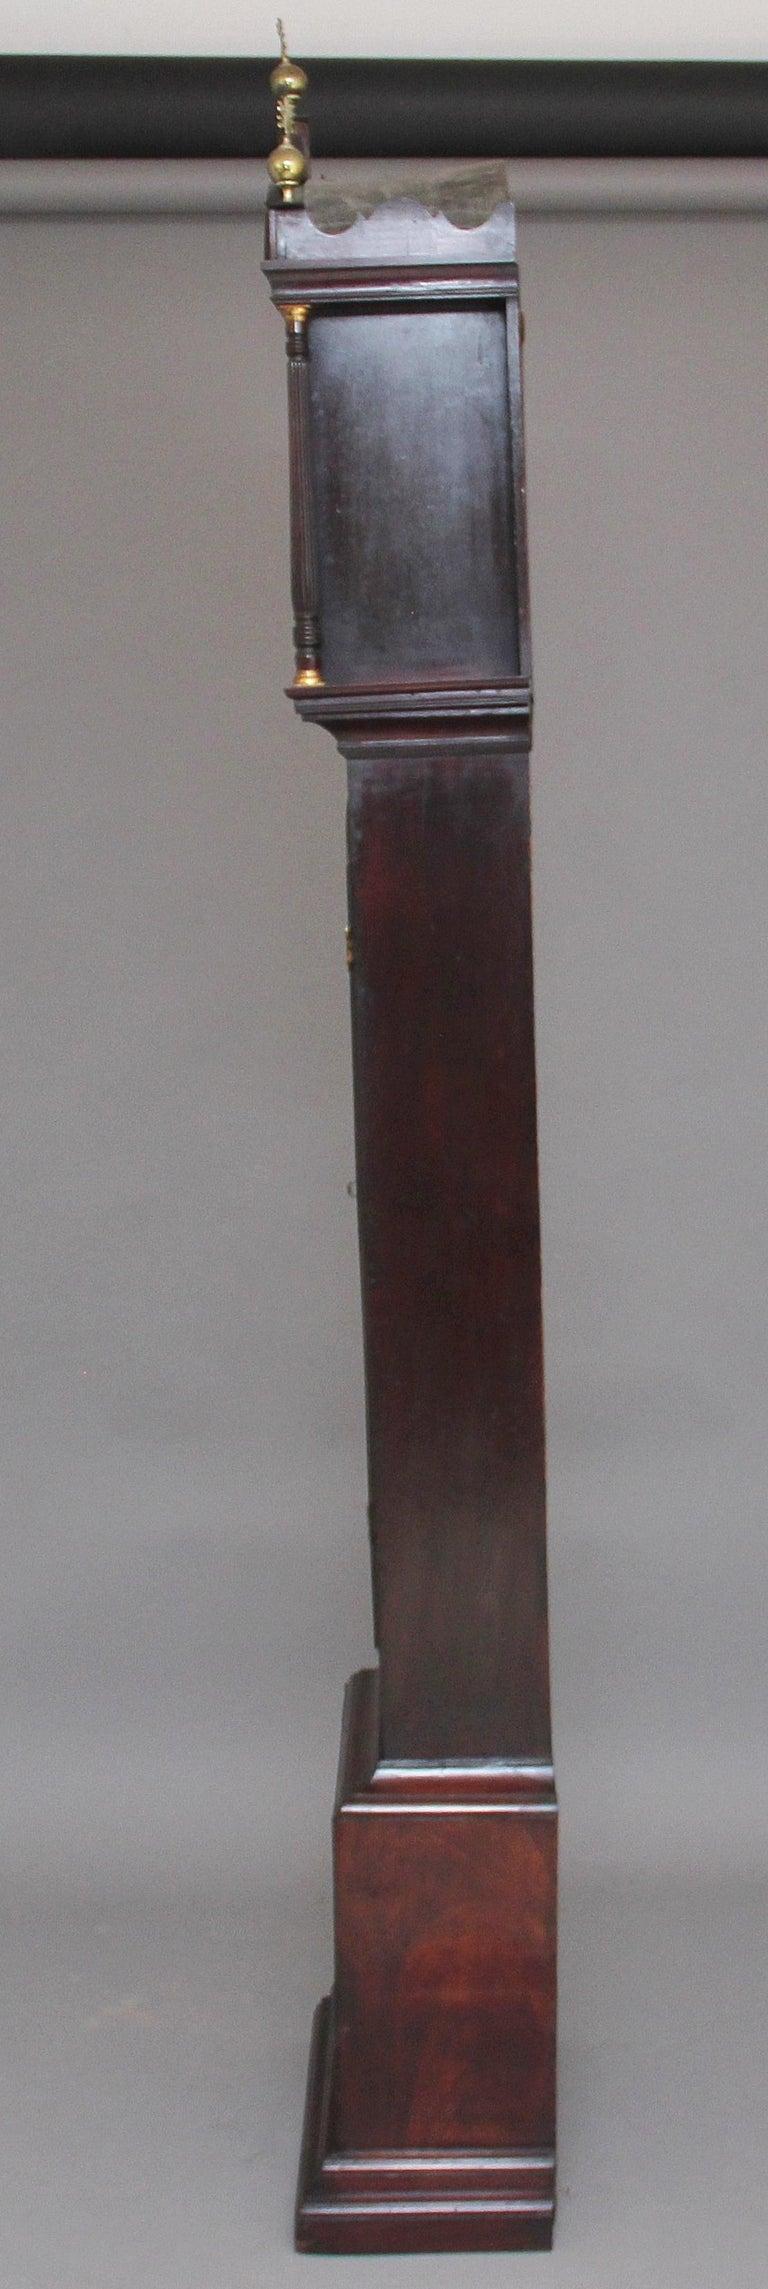 18th Century Mahogany Long Case Clock For Sale 1